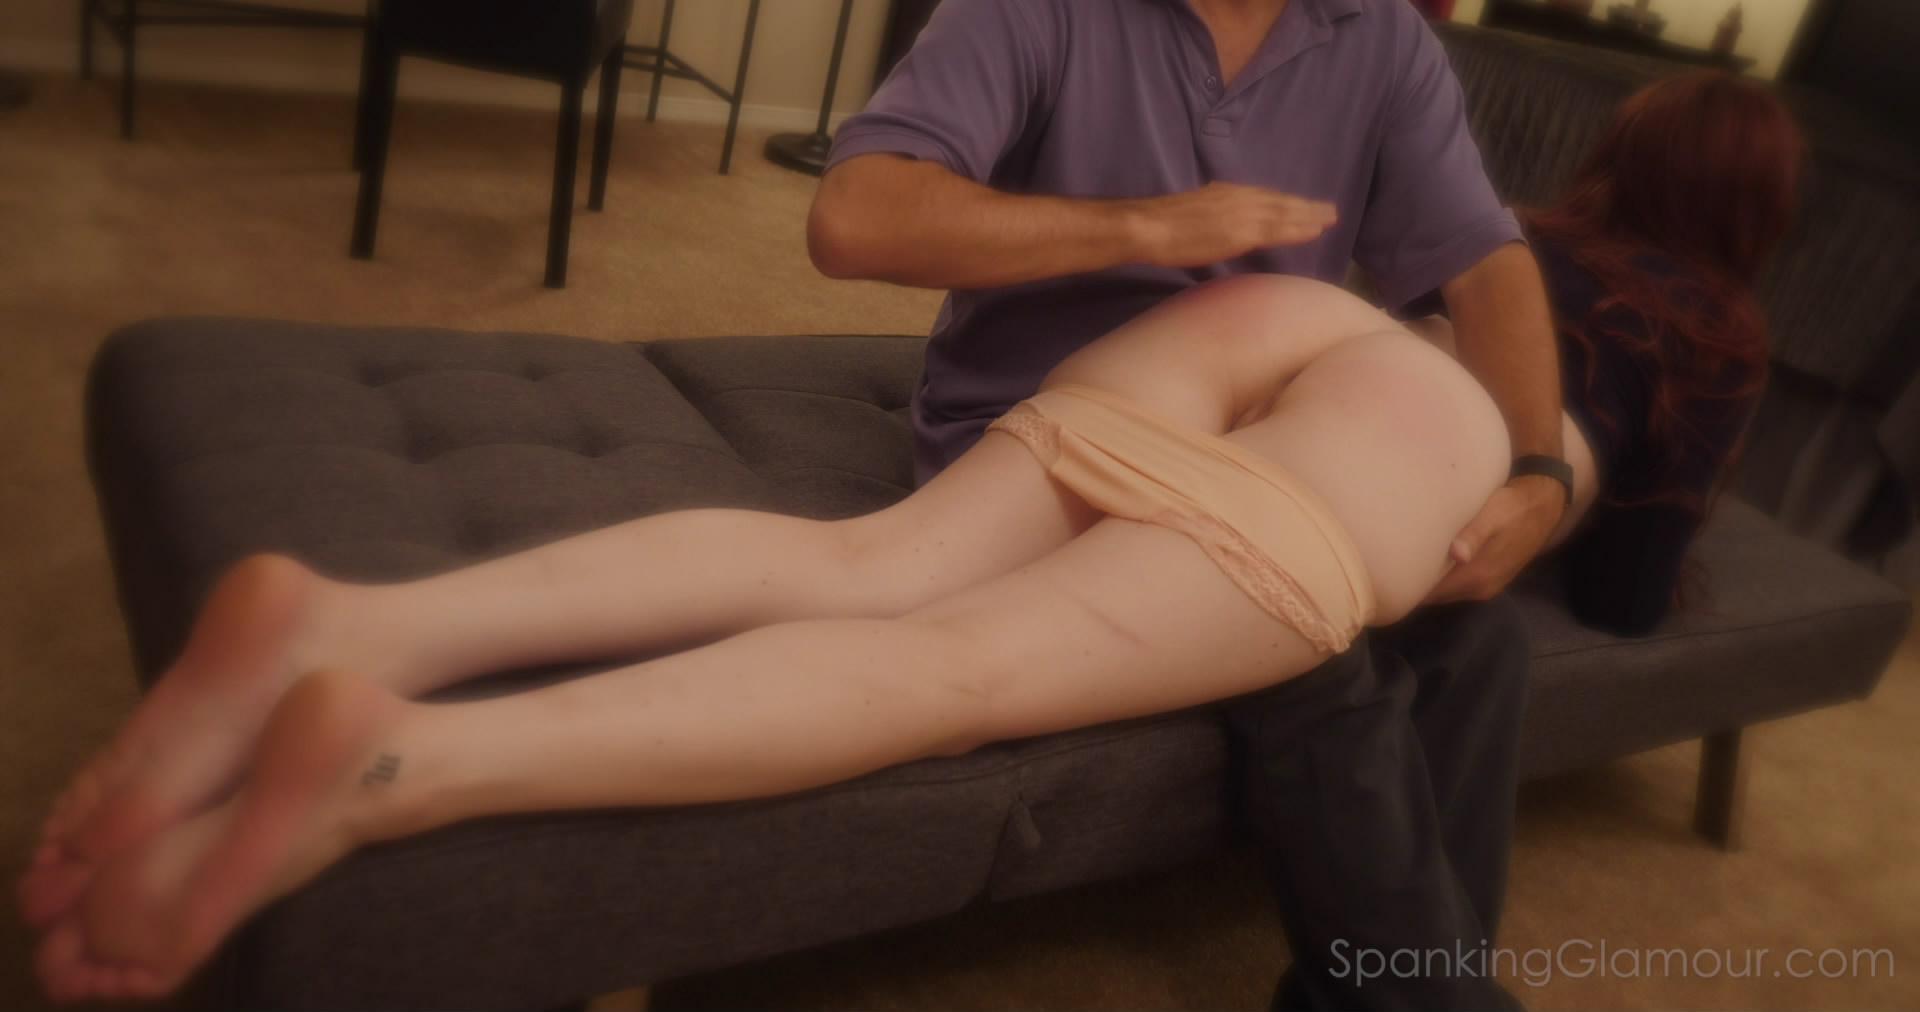 Spanking Glamor – MP4/Full HD – Aria Carson Bonus Tickle 1